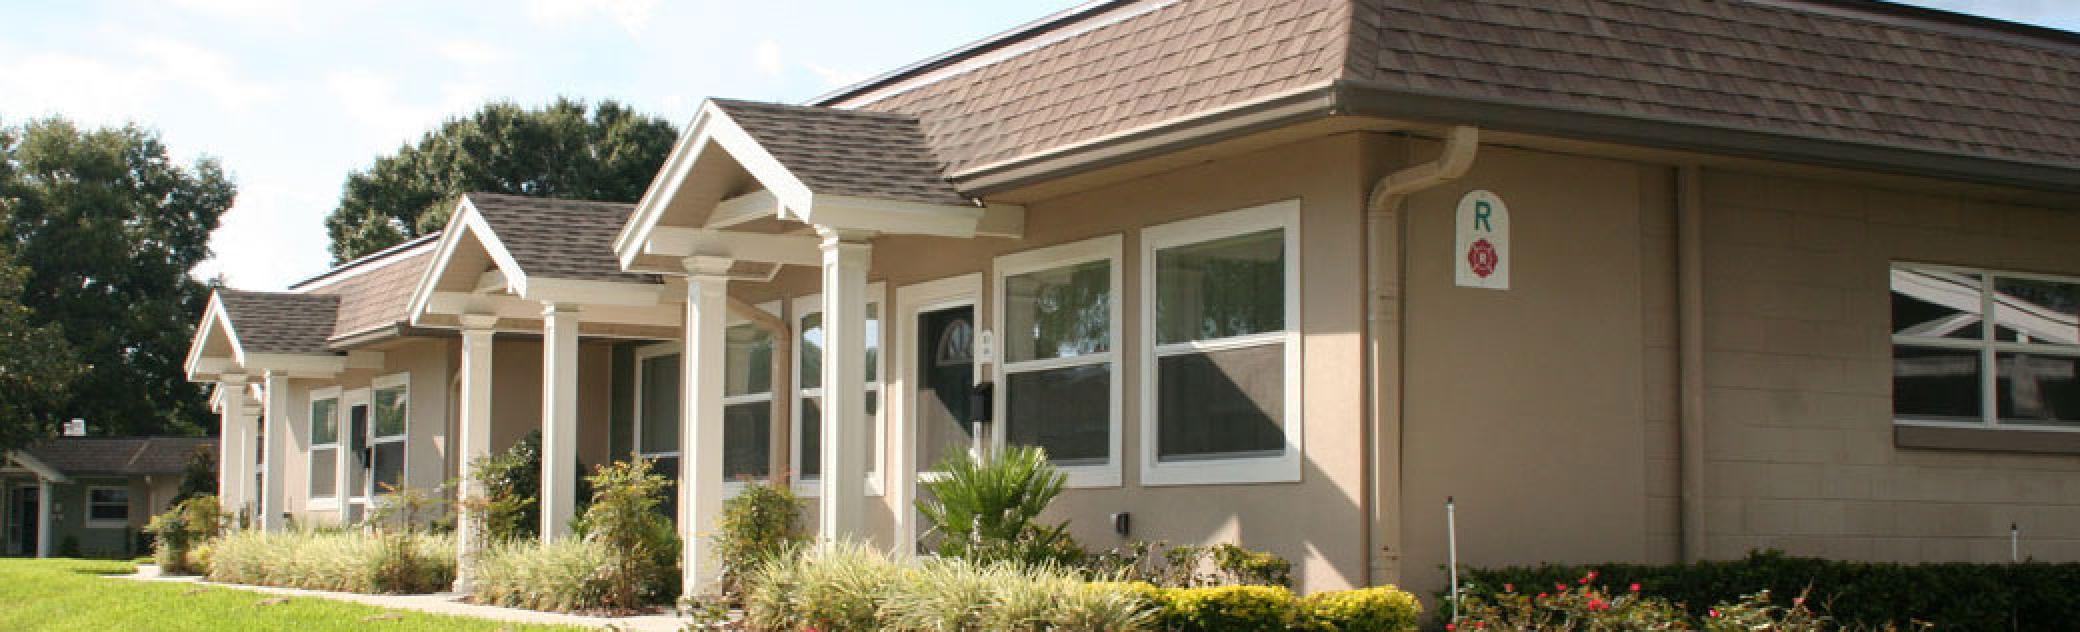 A Ccrc Life Care Retirement Community Lakeview Terrace